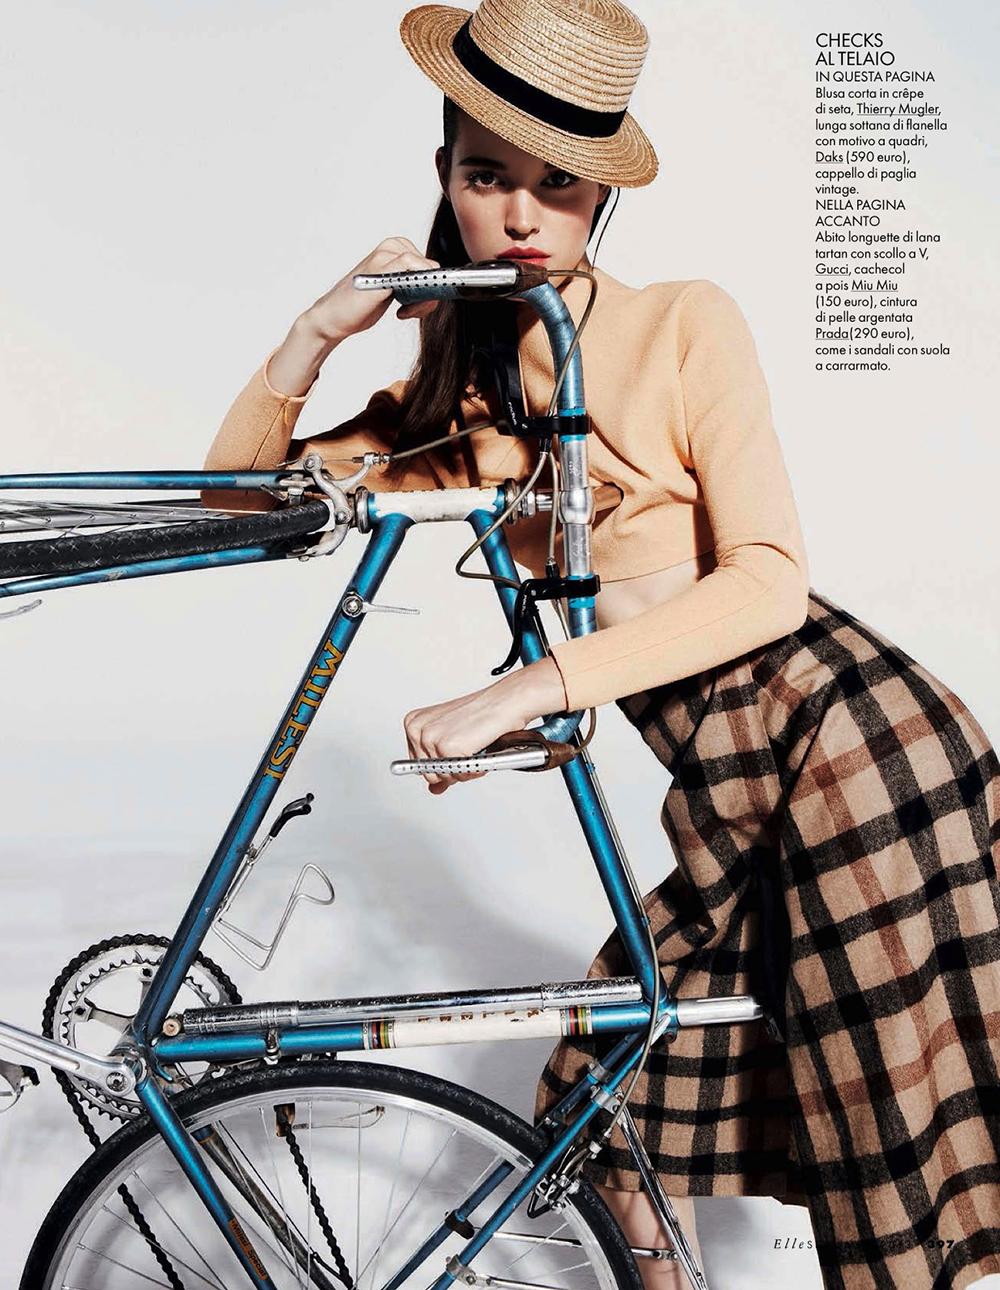 bicicletta trendy